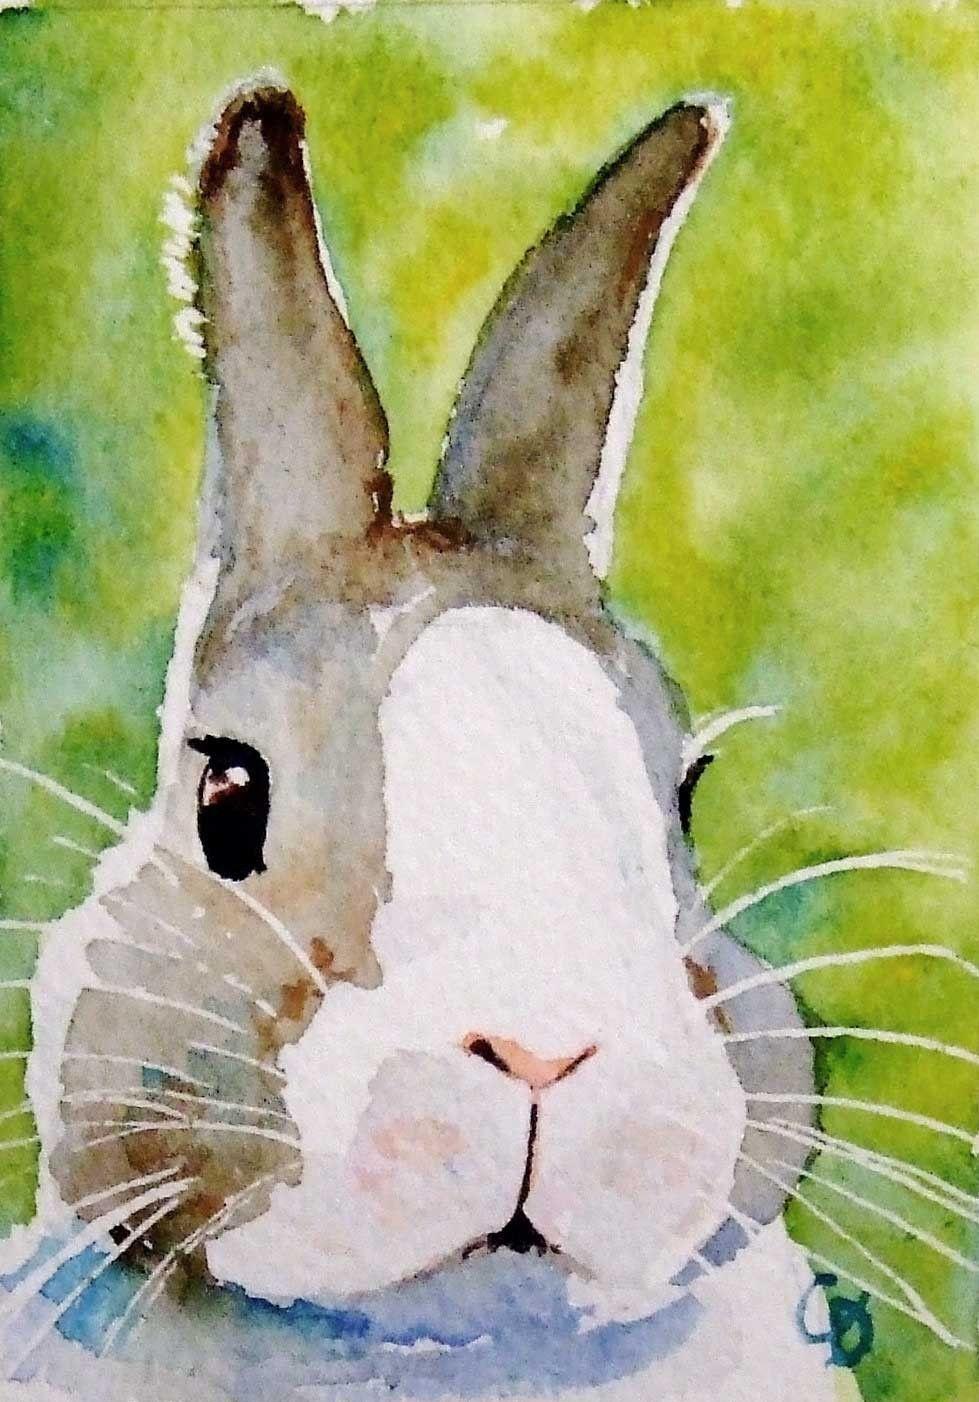 Watercolor artists names - Watercolor Art Artist Not Given Shari Brown Brown Pearman